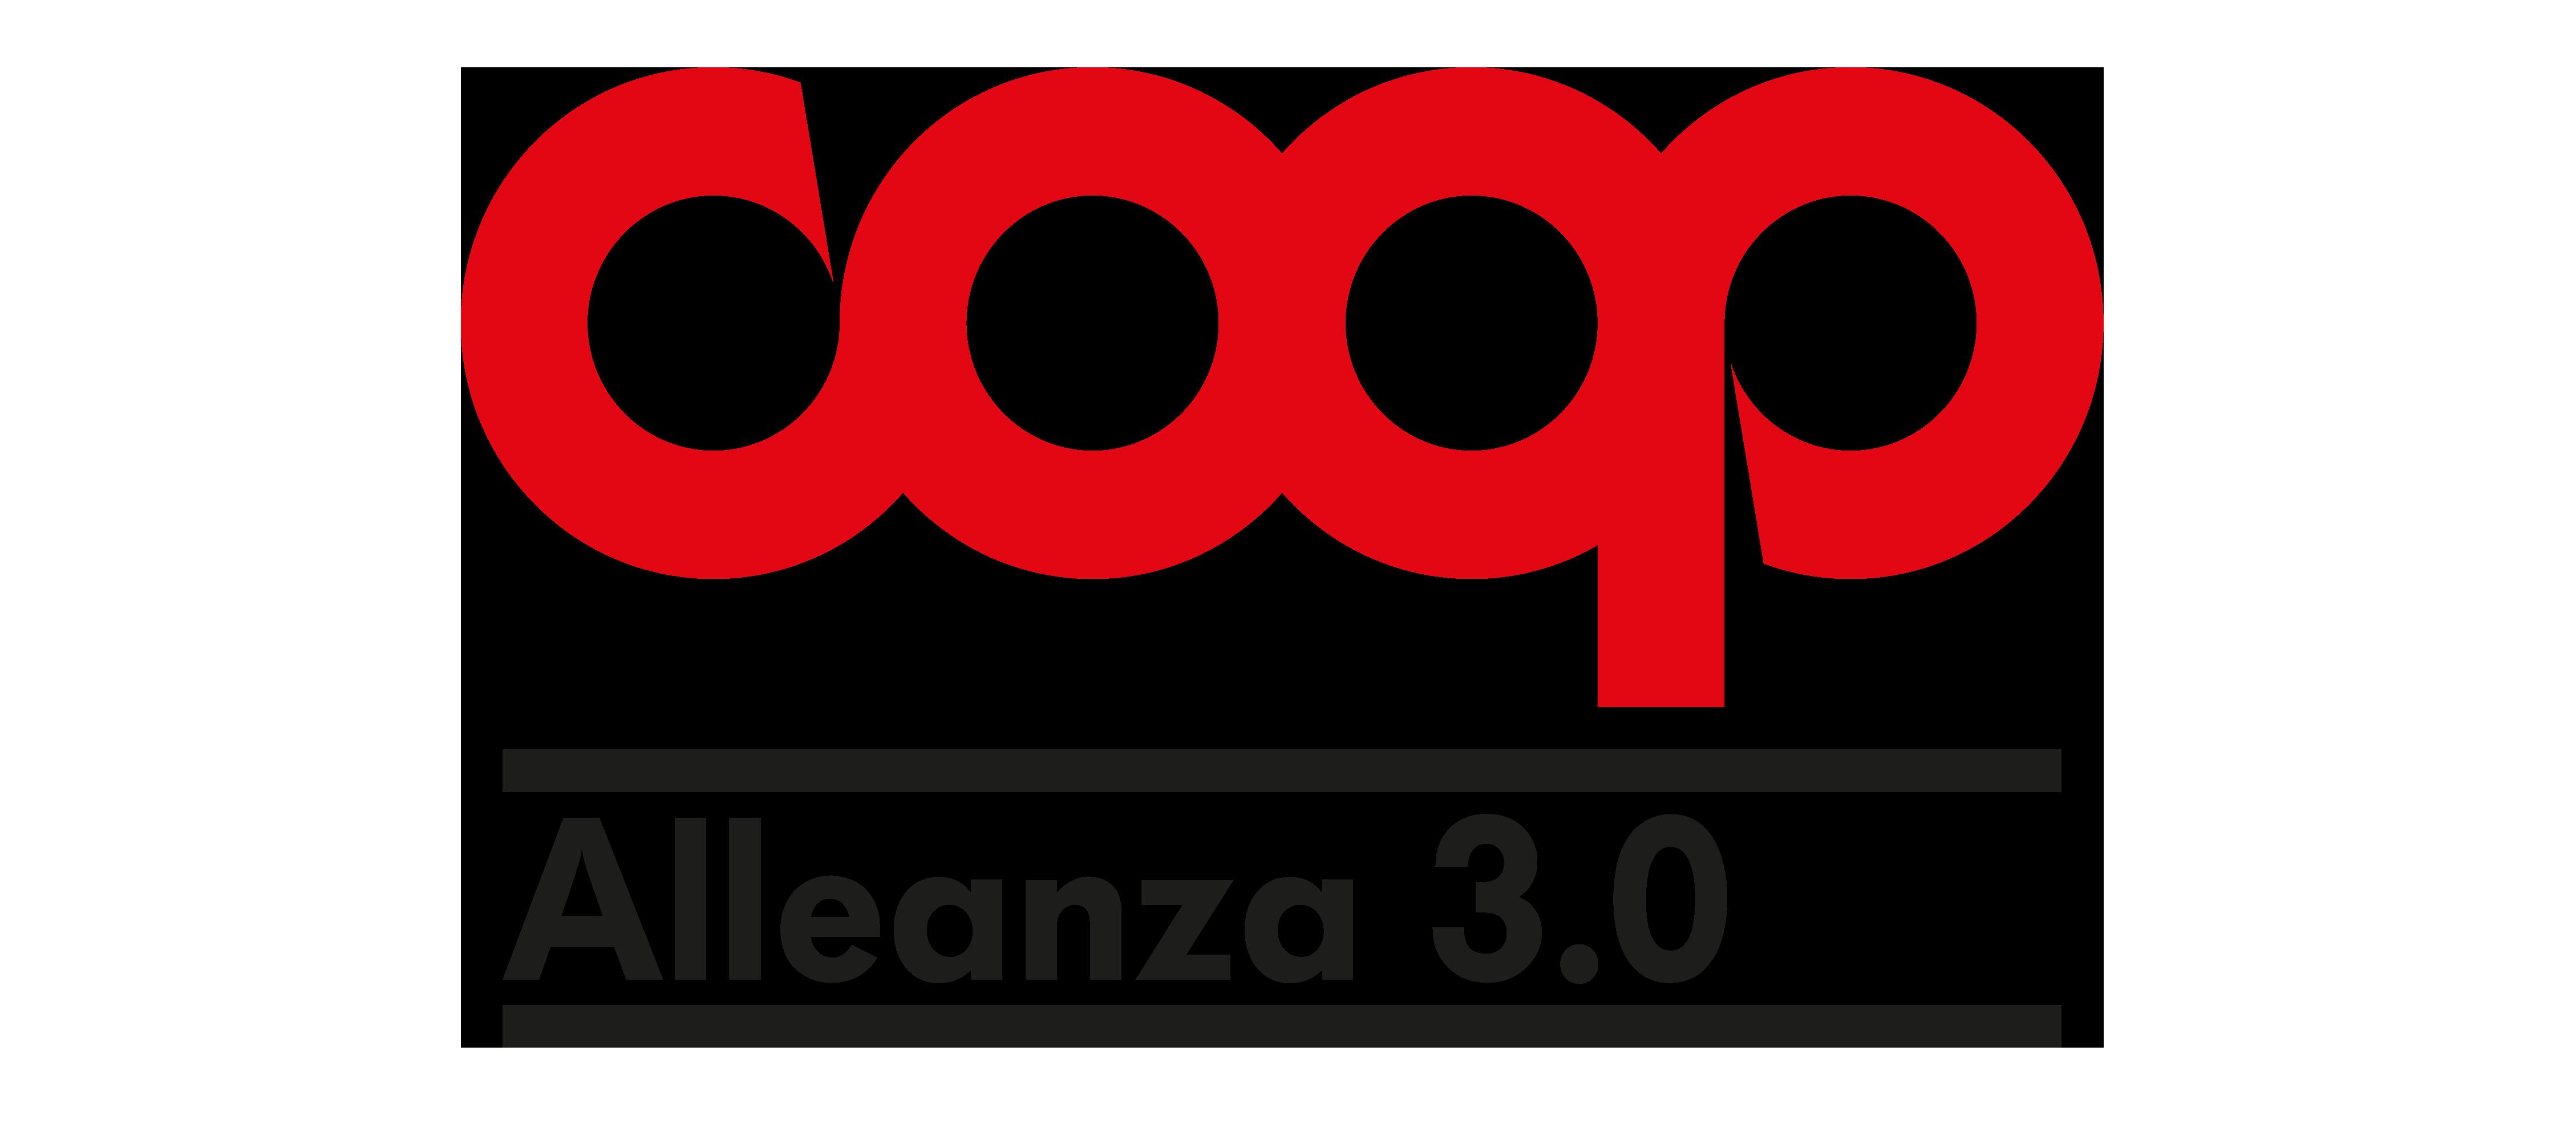 coop_alleanza_brand_manual-2